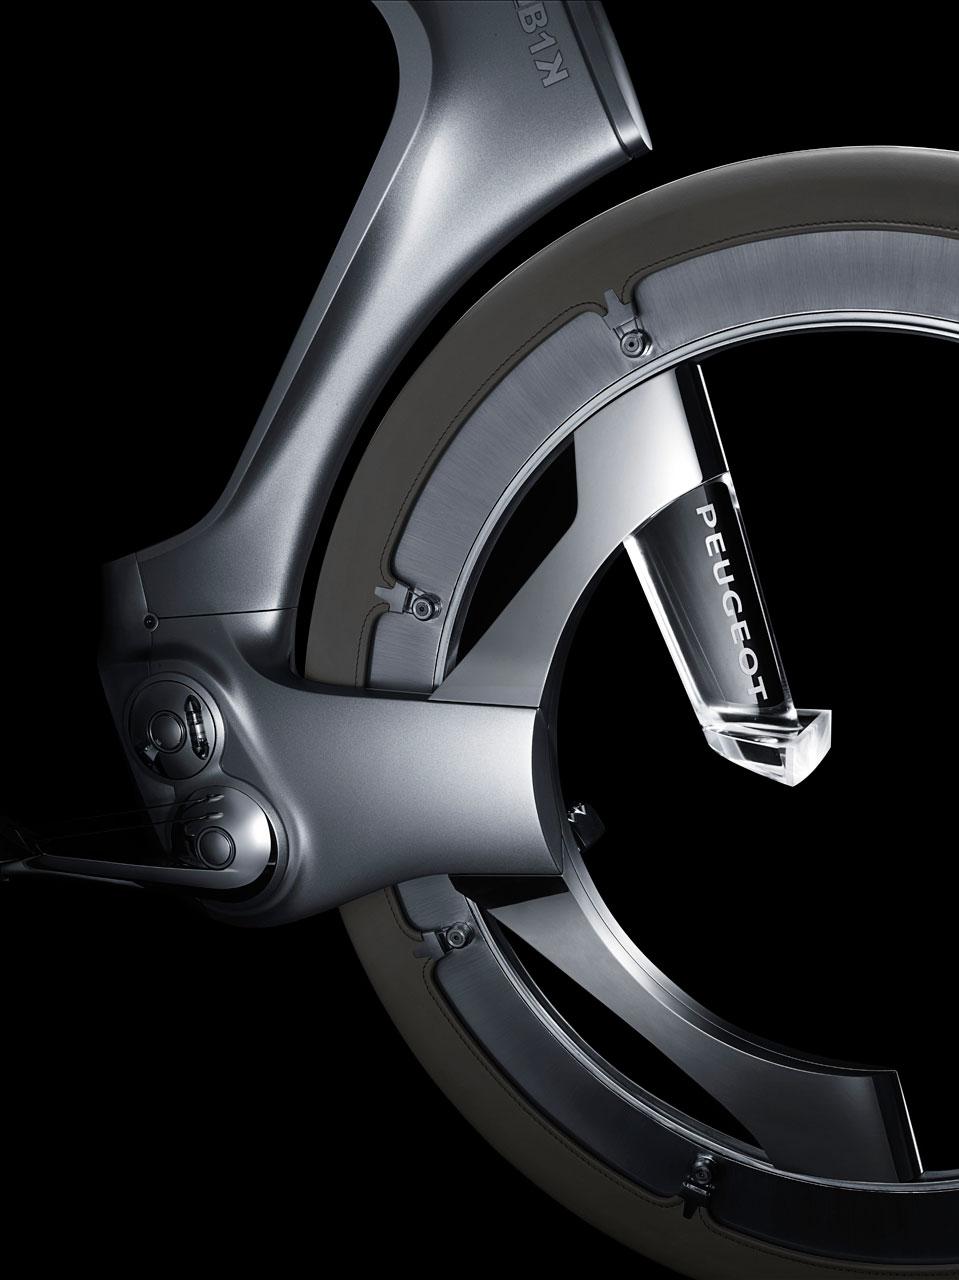 https://i2.wp.com/www.carbodydesign.com/archive/2010/02/peugeot-b1k-bike-concept/Peugeot-B1K-Bike-Concept-4-lg.jpg